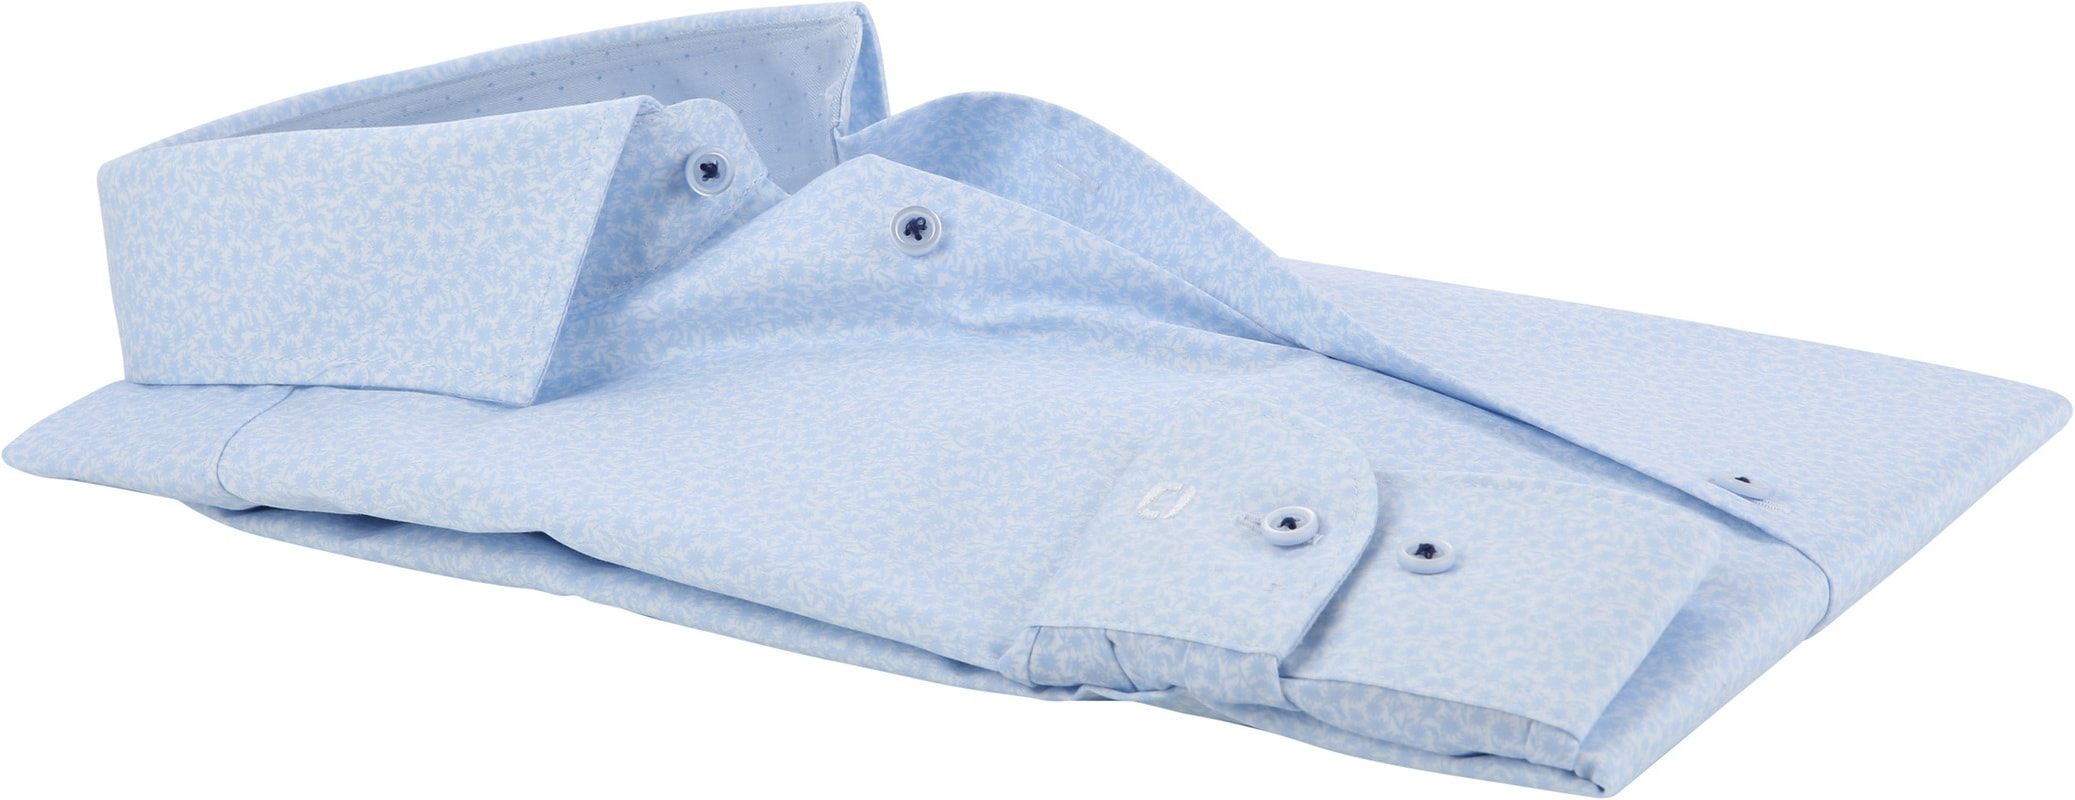 OLYMP Level 5 Overhemd Bloem Blauw BF - Blauw maat 37